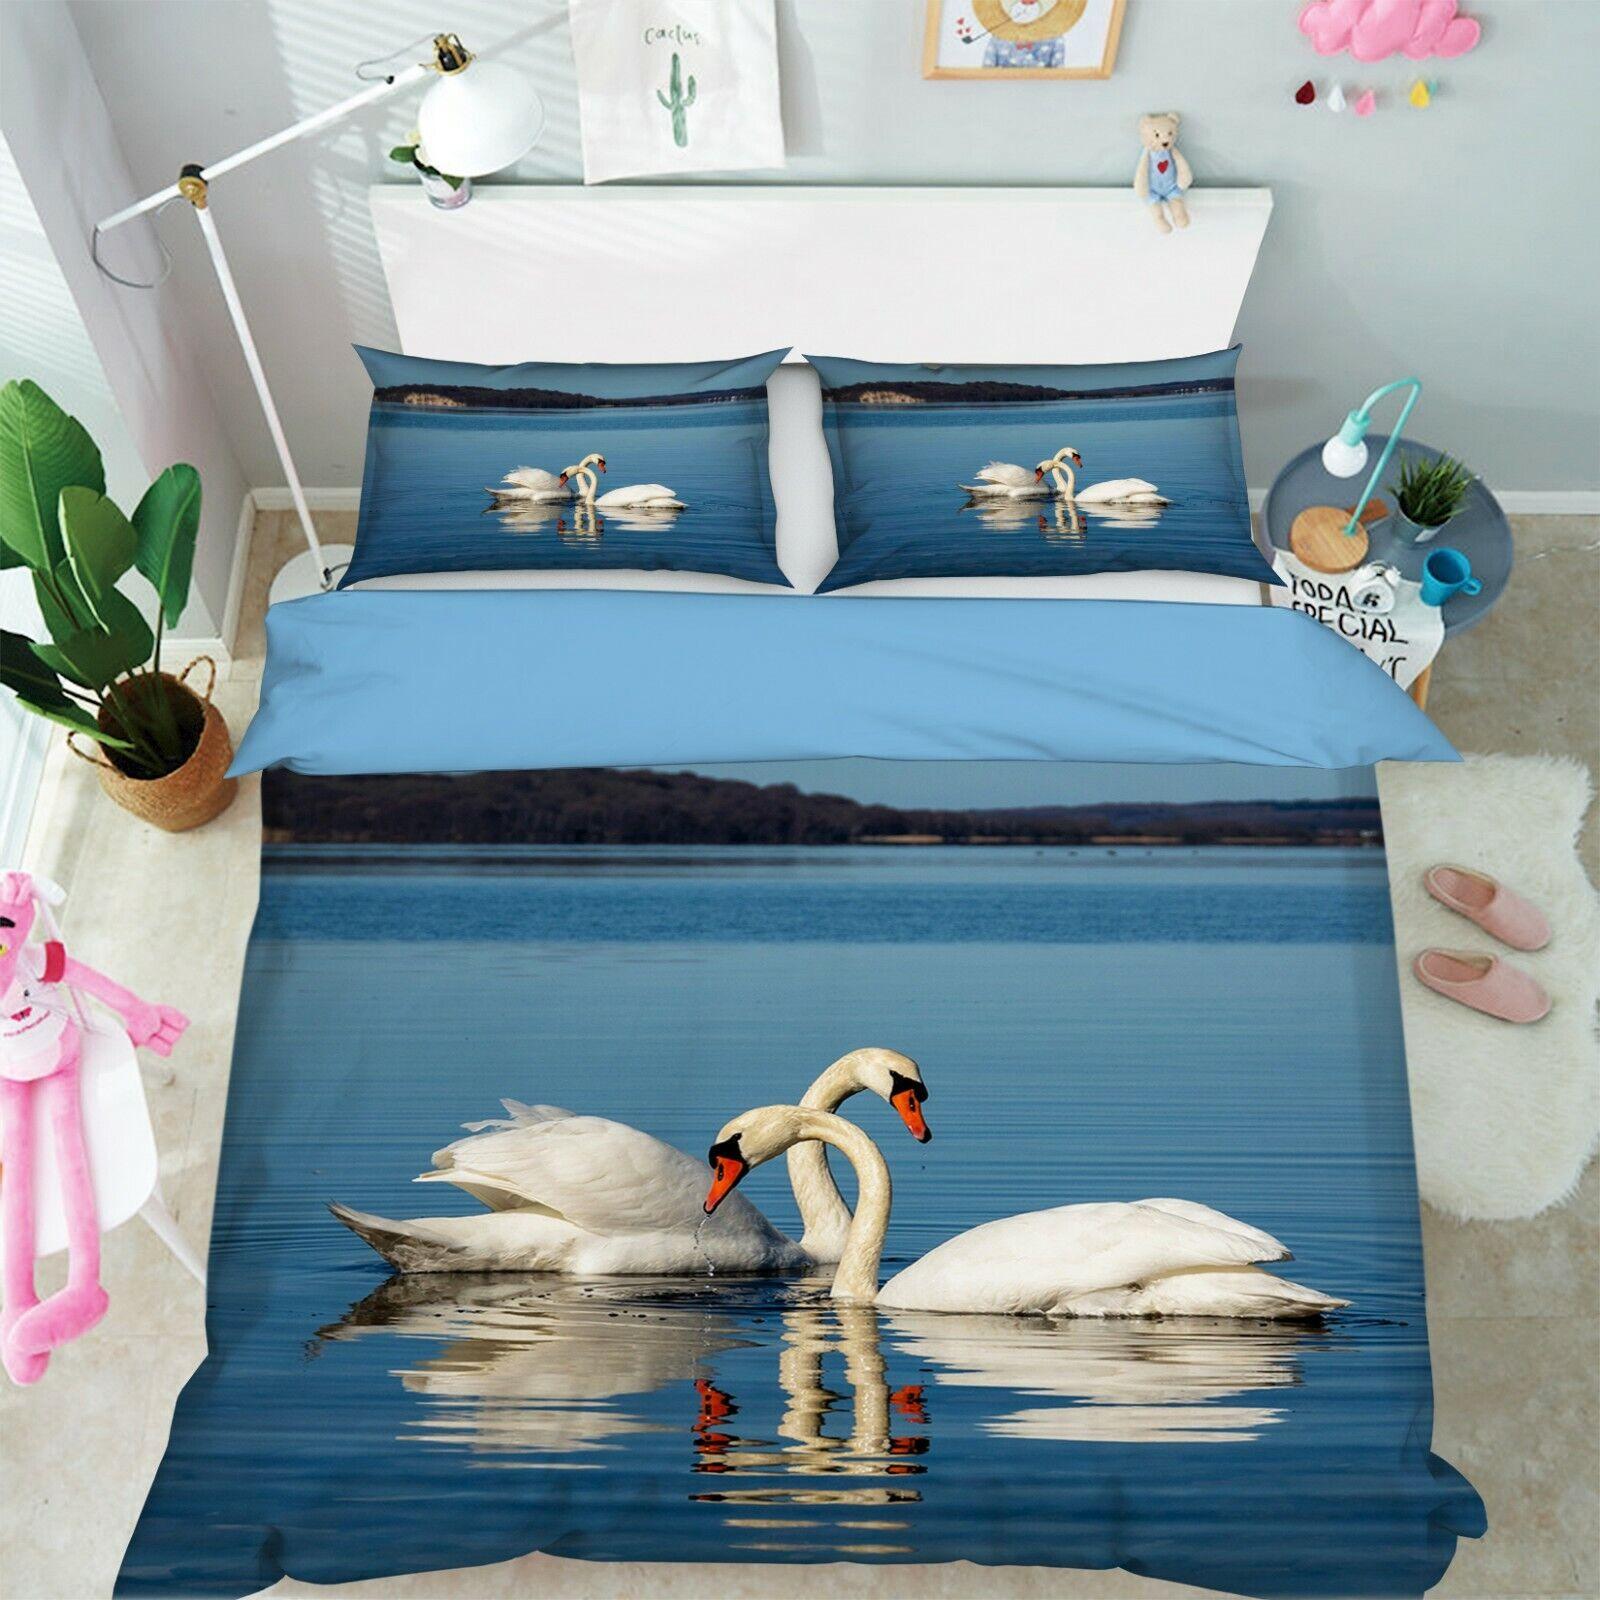 3D Swan Lake T101 Animal Bett Pillowcases Quilt Duvet Startseite Set Königin König Sunday